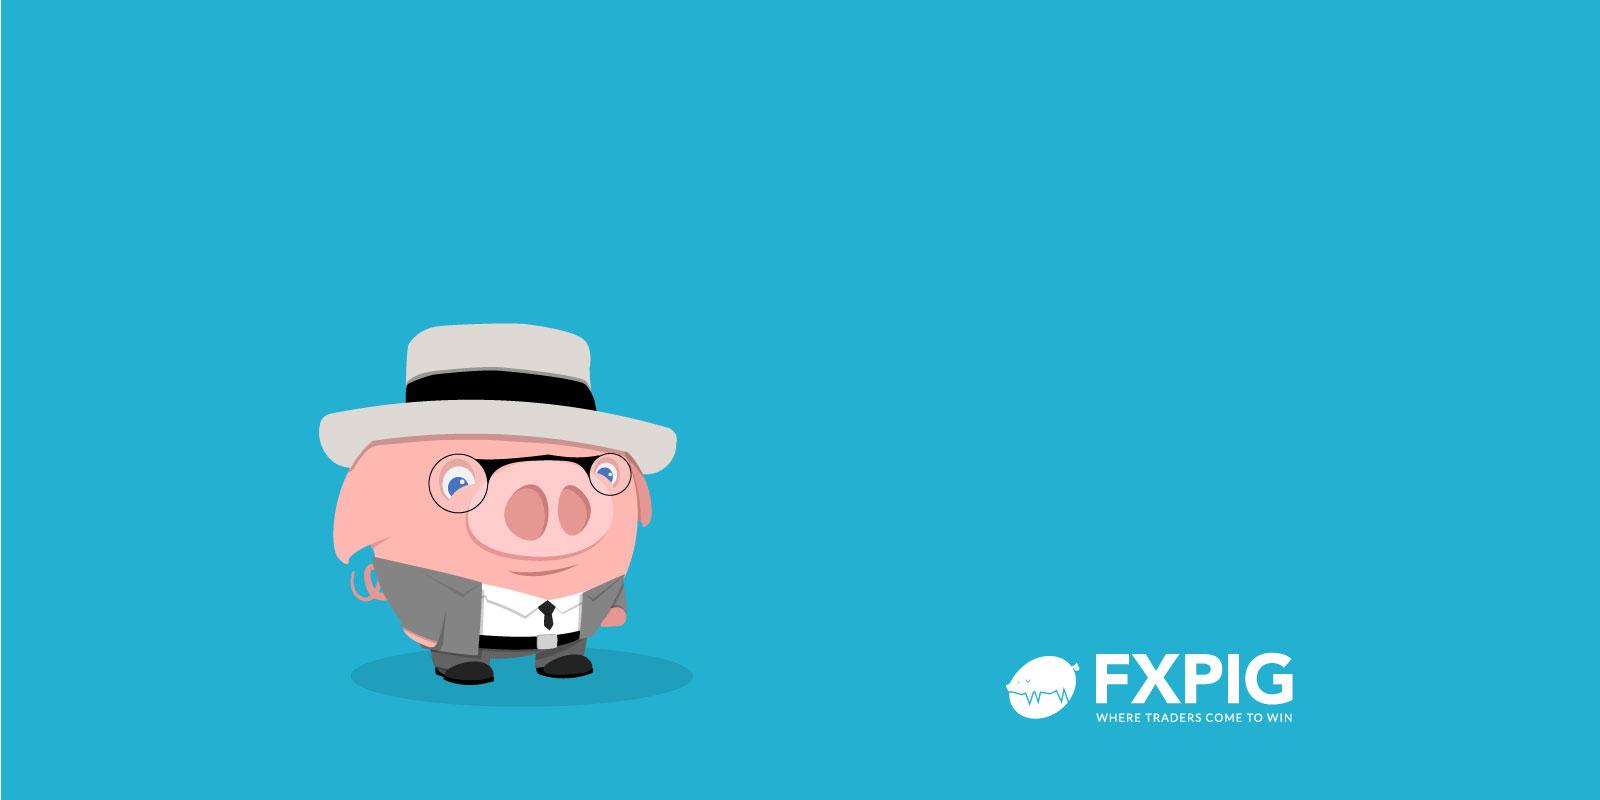 FOREX_FXPIG_Making-money_Jesse-Livermore